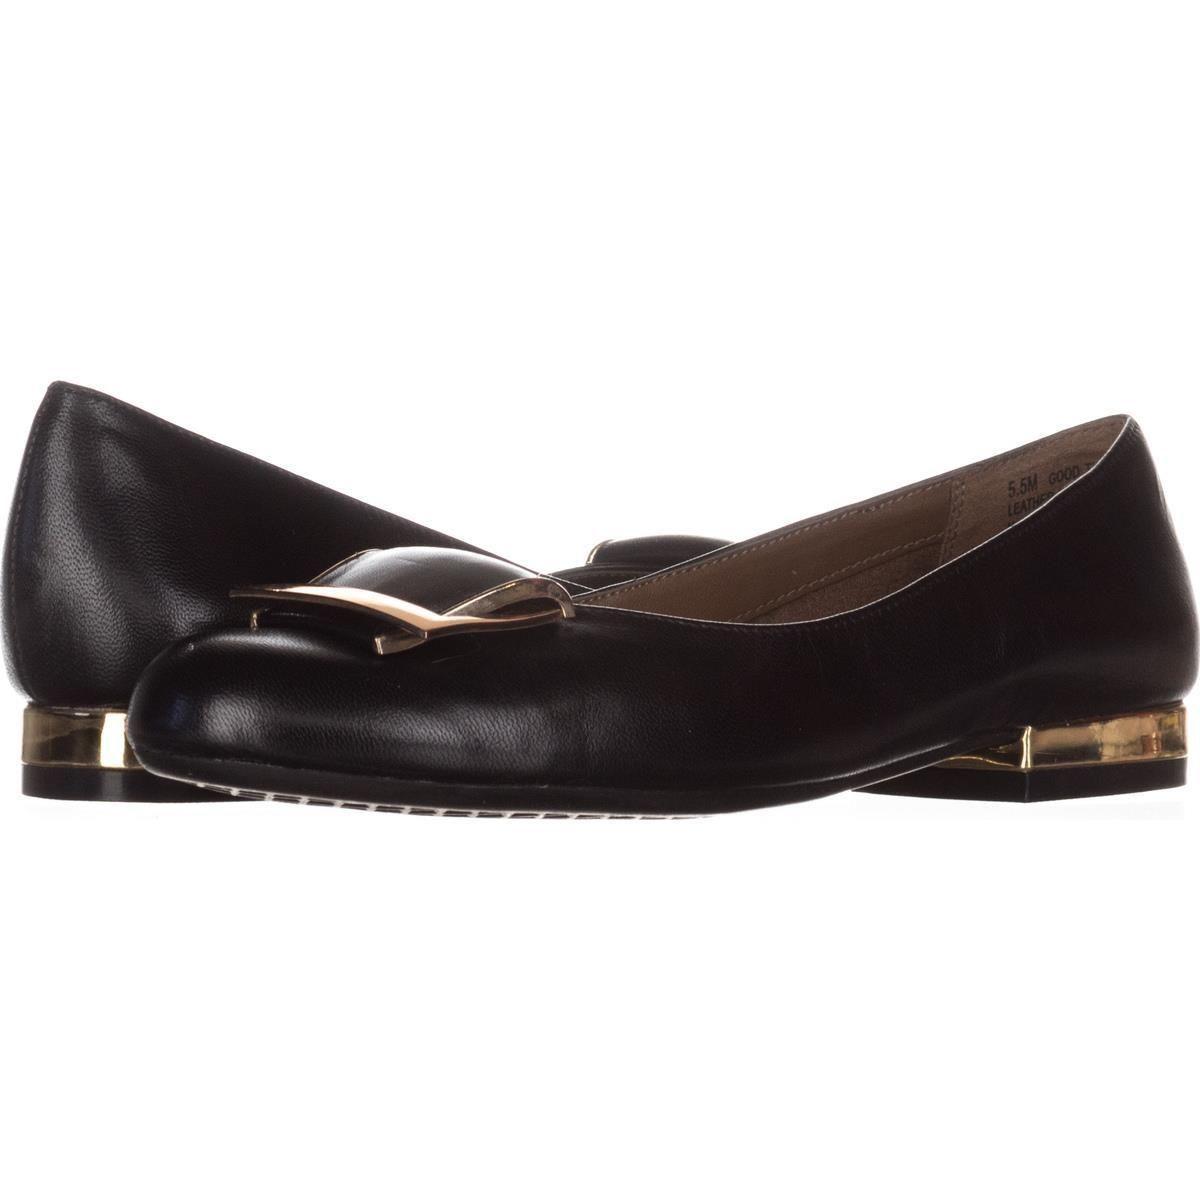 Femmes Aerosoles Good Times Chaussures Loafer yPQD9kH1Jy